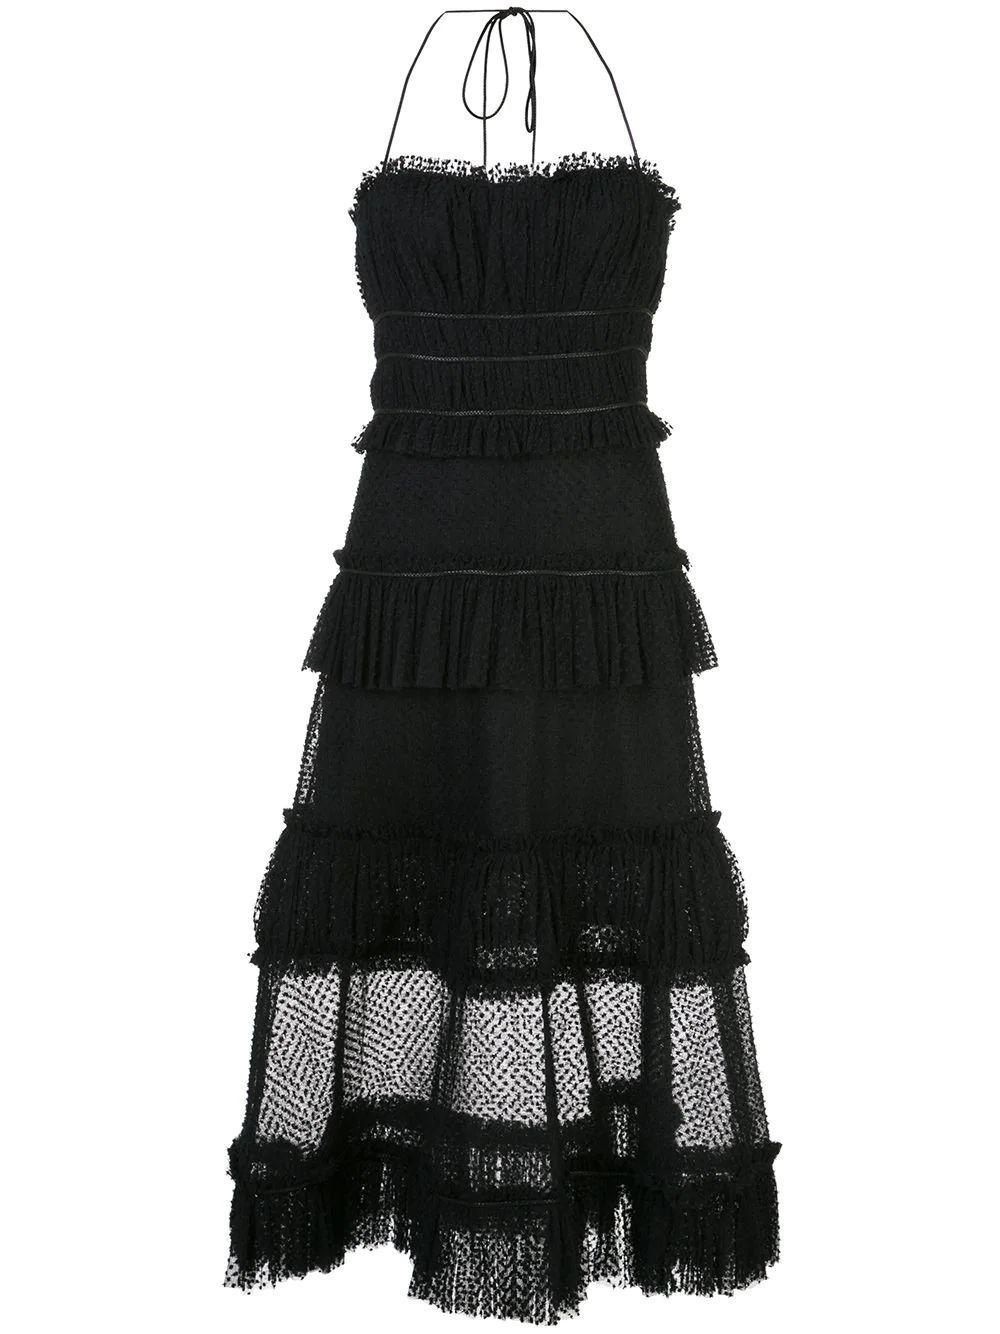 Mesh Layered Midi Dress Item # ANGELIA